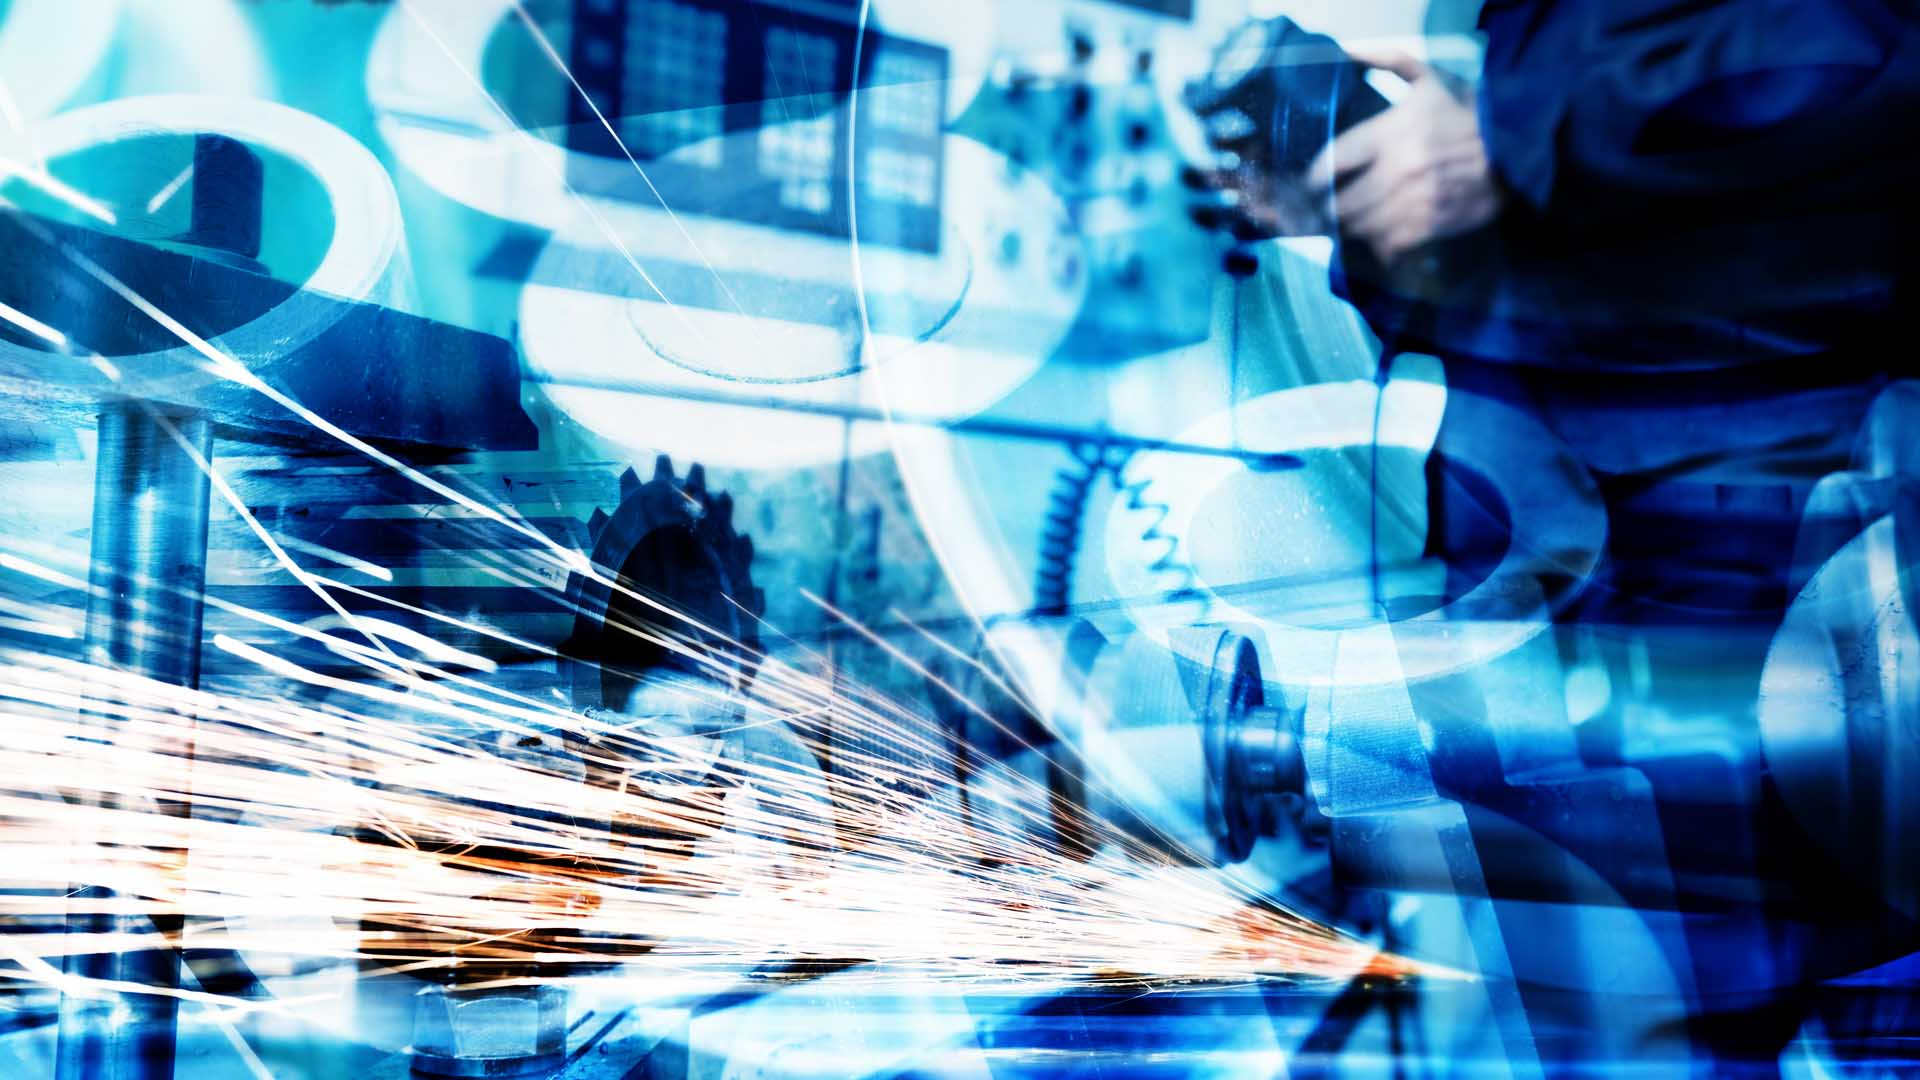 3 vantaggi di Liferay DXP per l'industria manifatturiera